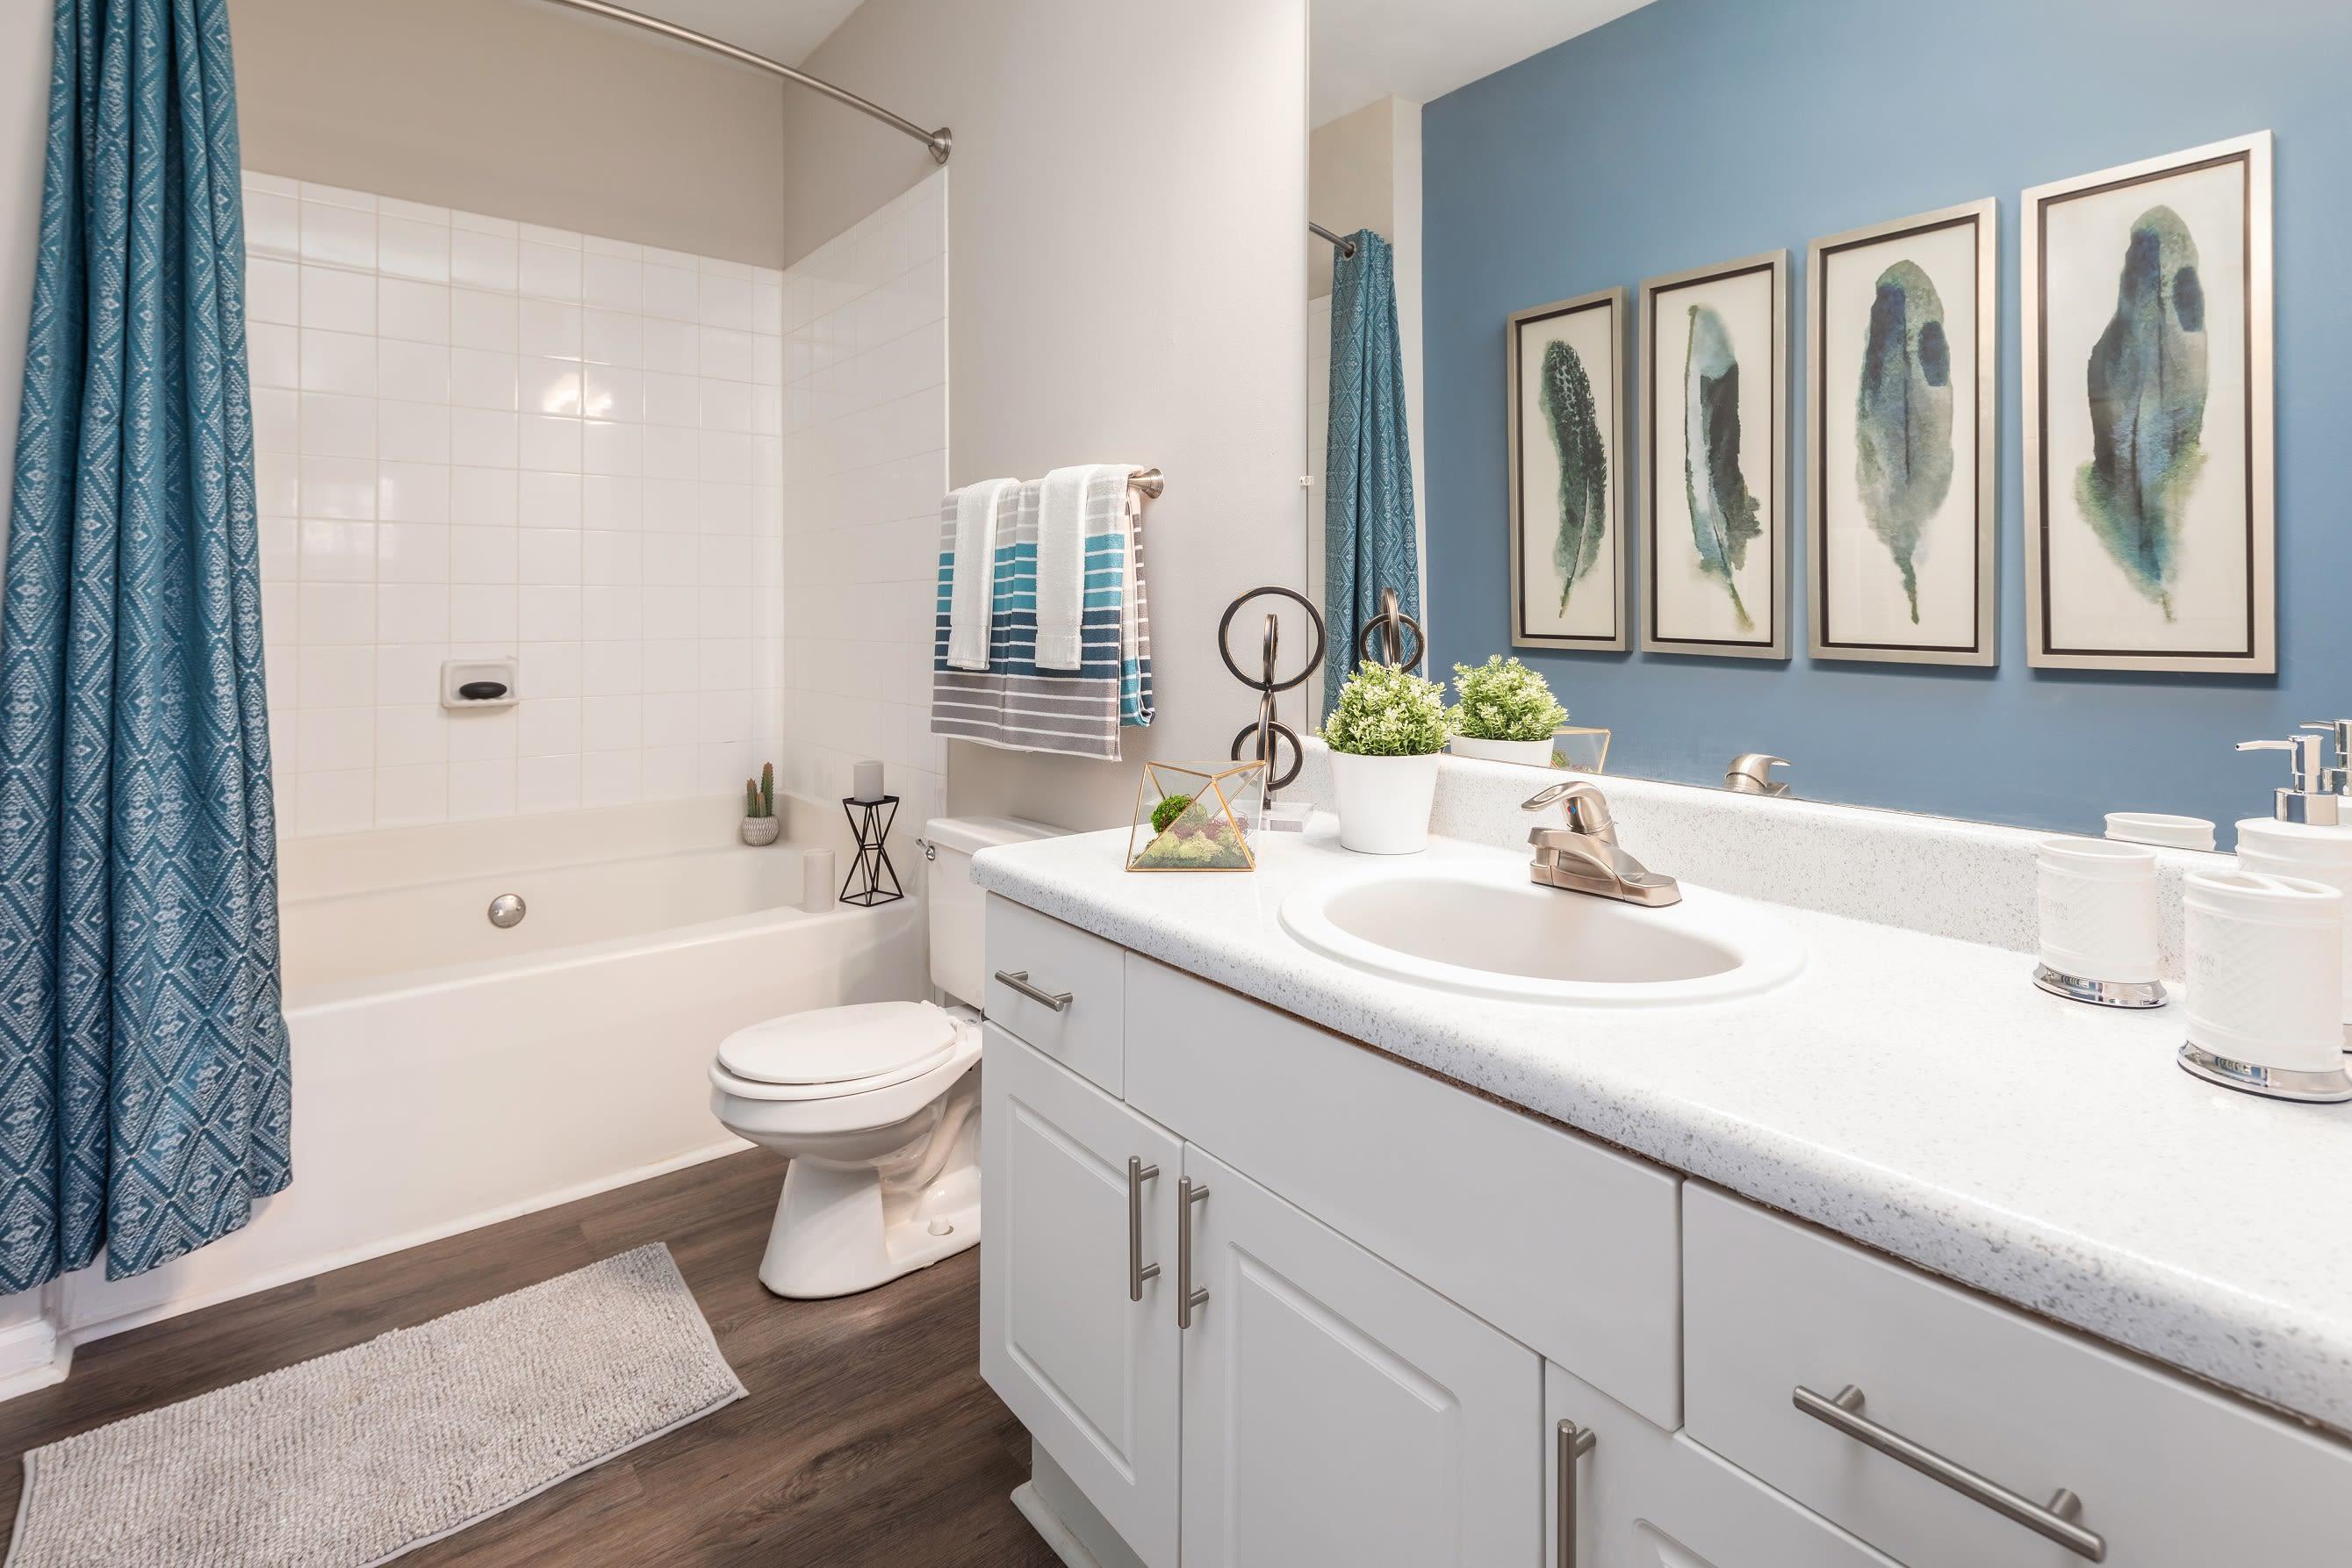 Main bathroom at Highlands at Alexander Pointe in Charlotte, North Carolina